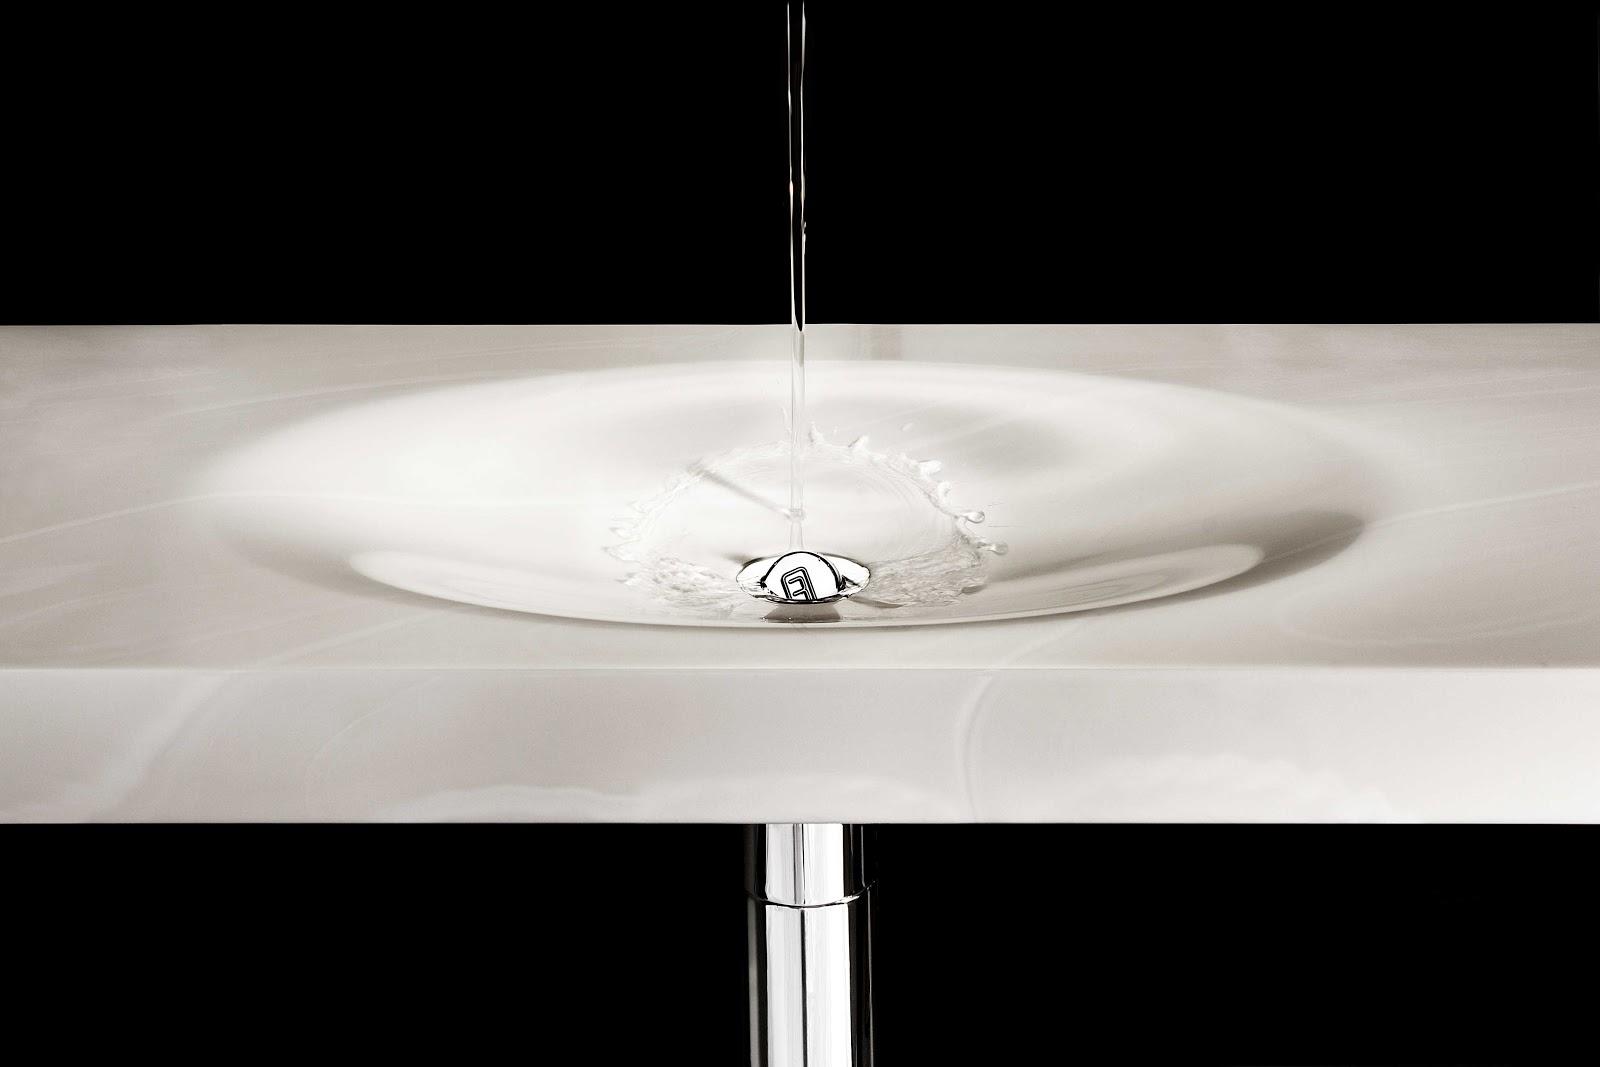 Bathrooms Basins : ... Design: Australian Made bathroom products - Minosa basins & vanities